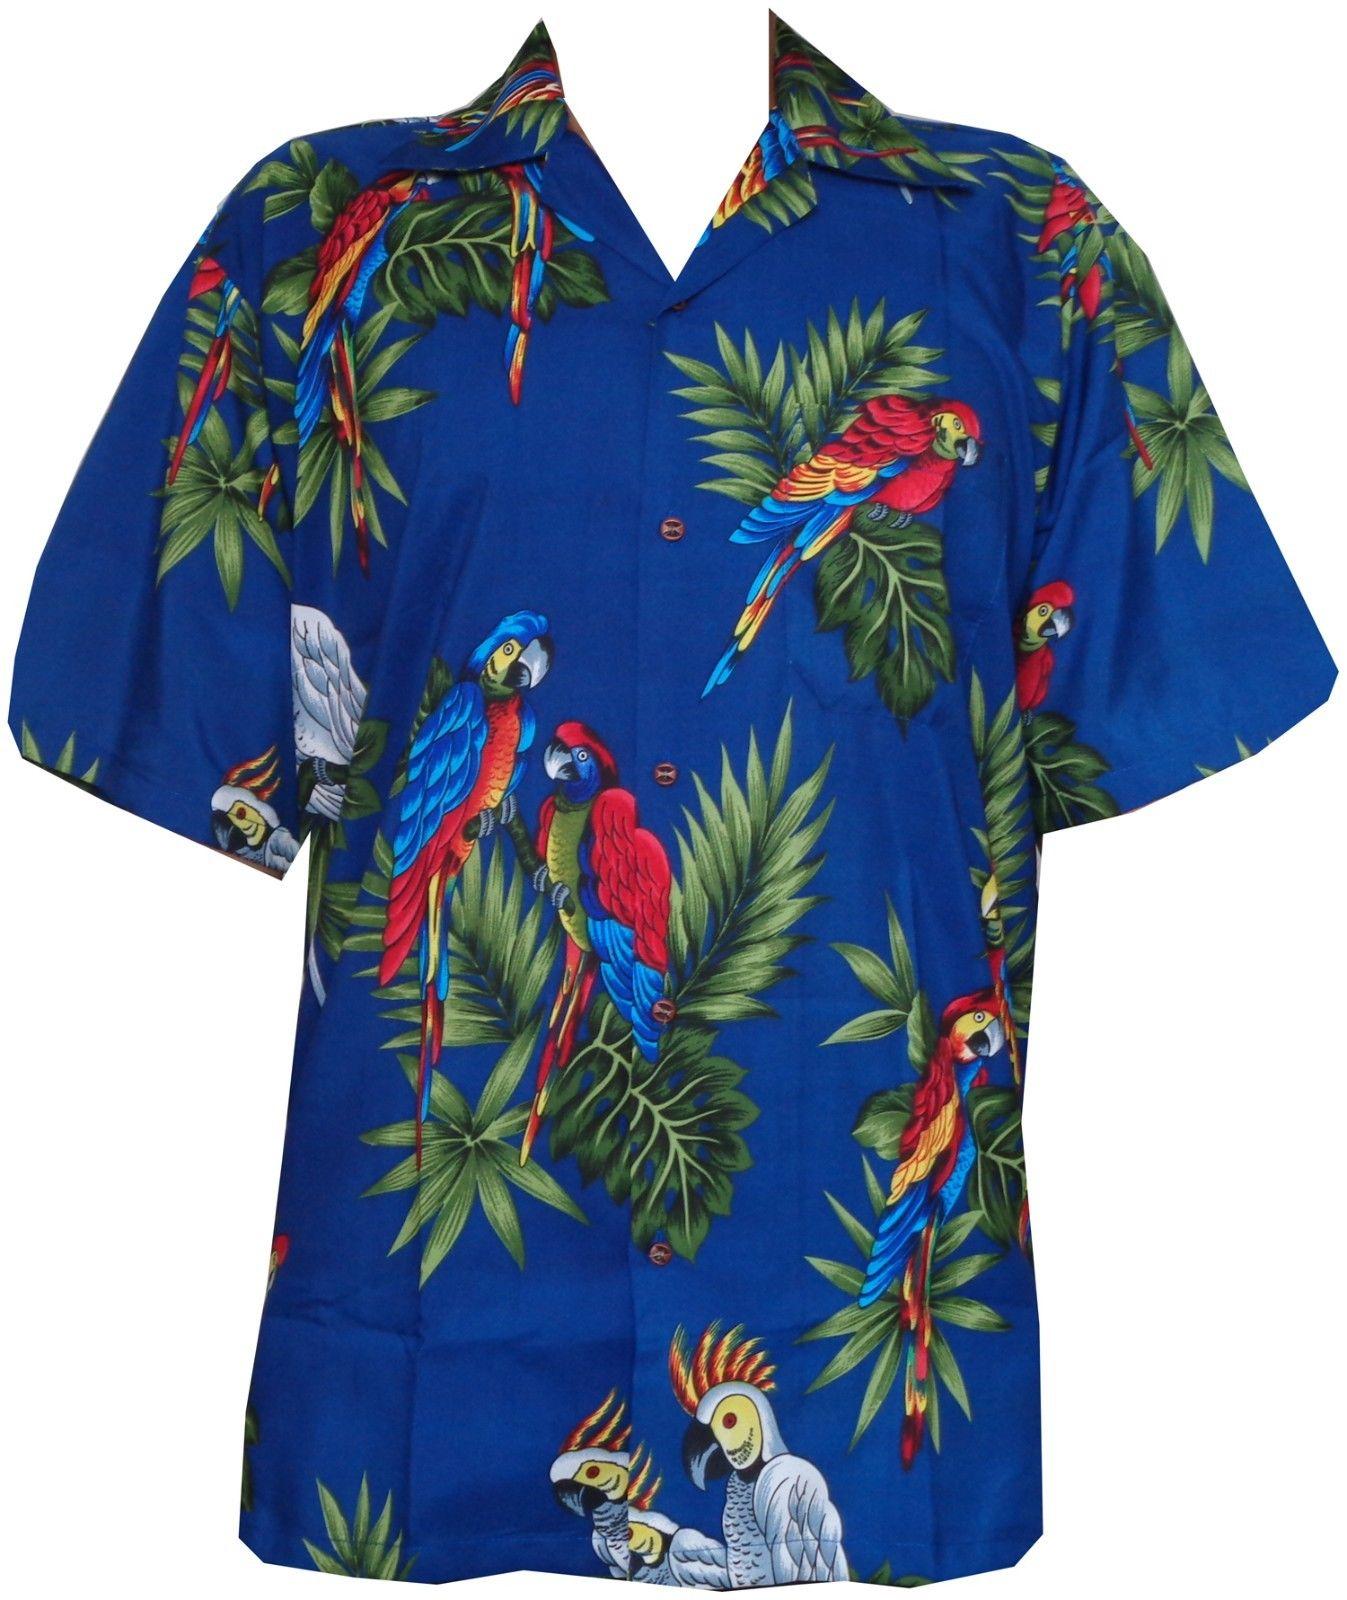 Hawaiian Shirt Mens Parrot/Toucan Print Beach Aloha Party ...